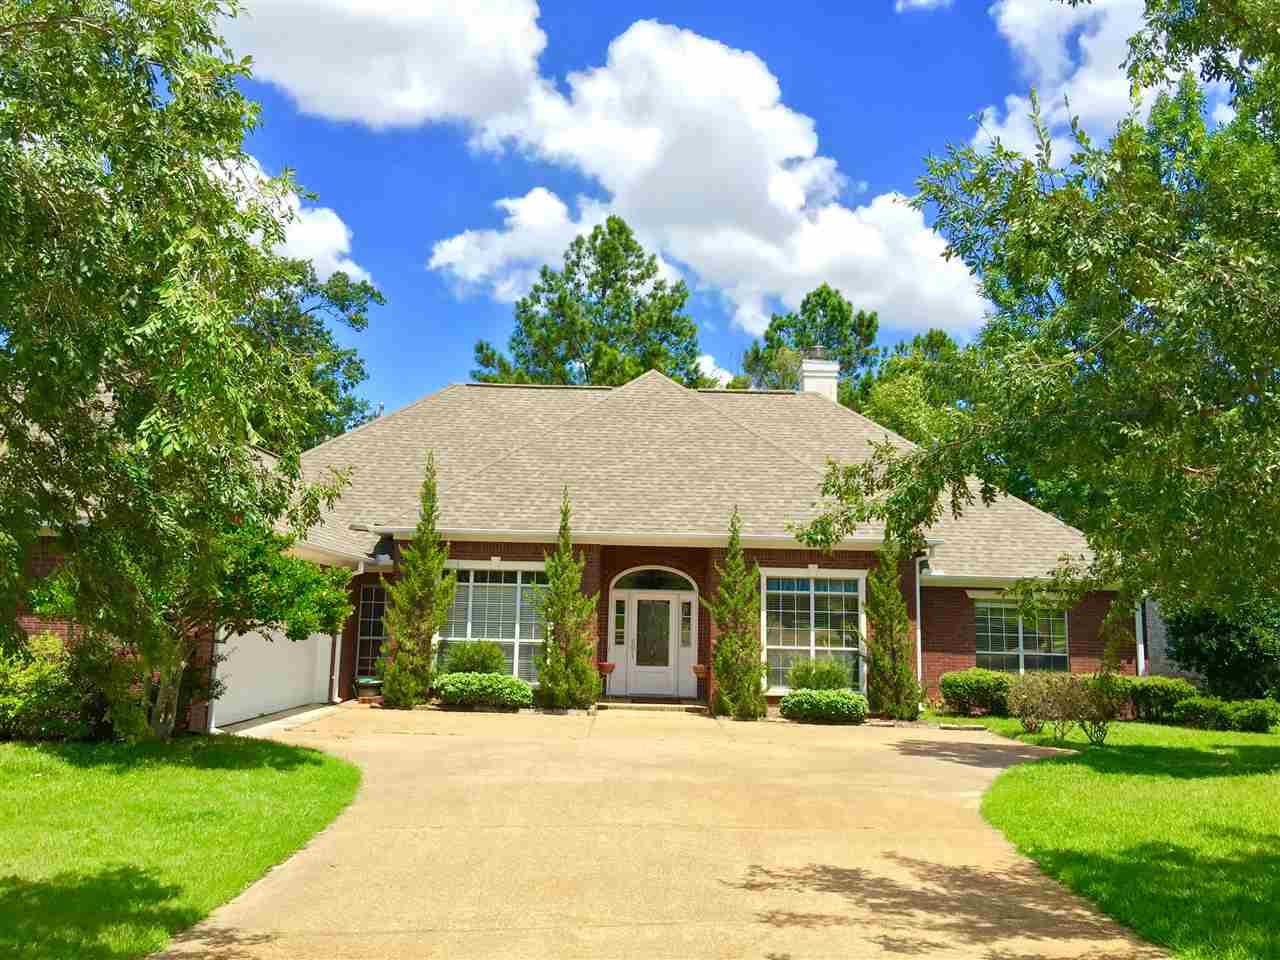 Real Estate for Sale, ListingId: 34432717, Brandon,MS39047